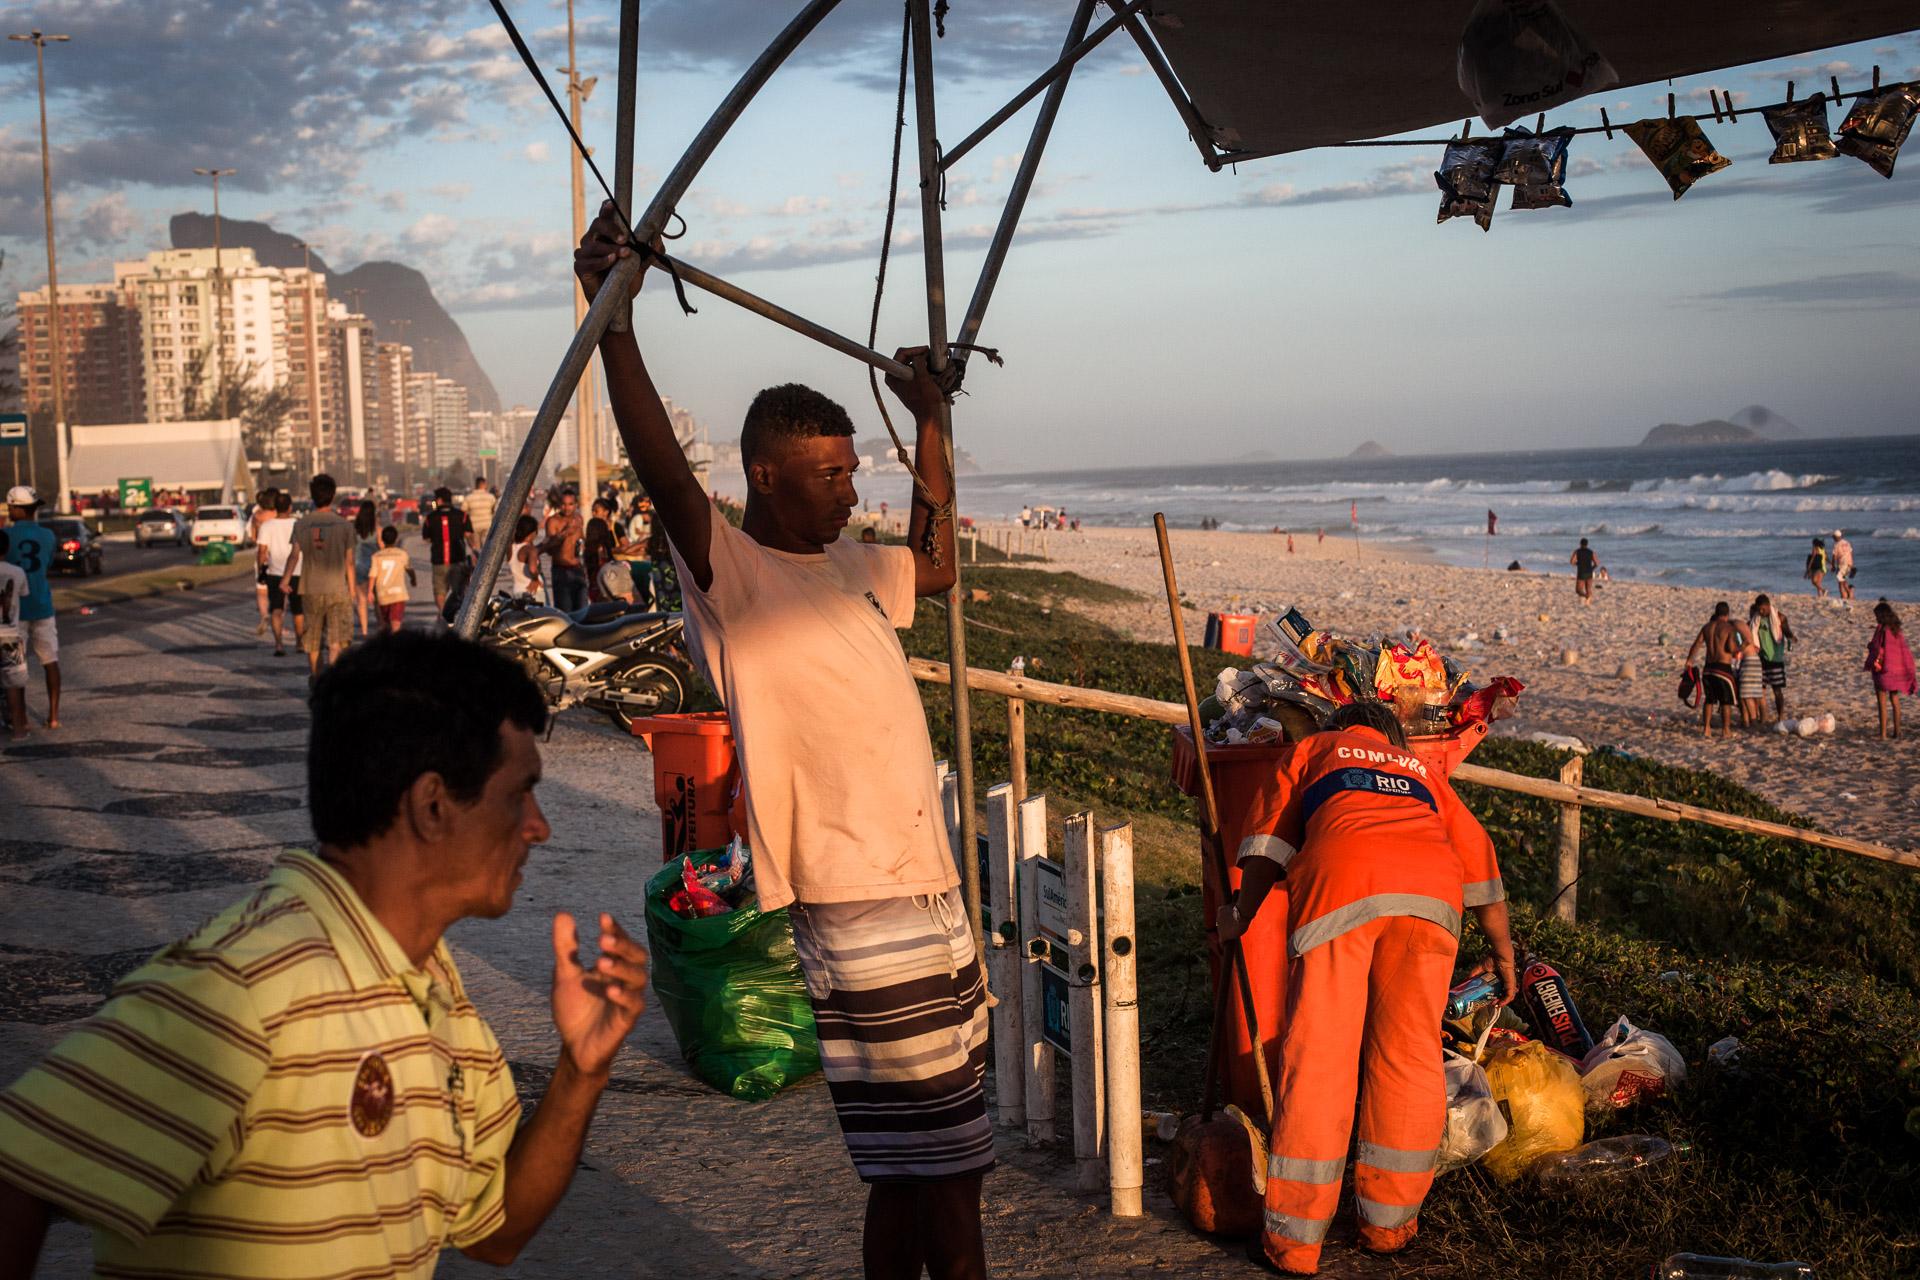 Rio de Janeiro, le 15 Novembre 2013. Fin de journée sur la plage de Barra da Tijuca. Une femme gari commence le nettoyage de la plage.Rio de Janeiro, November 15, 2013. End of the day on the beach in Barra da Tijuca. A Gari  woman starts cleaning the beach.